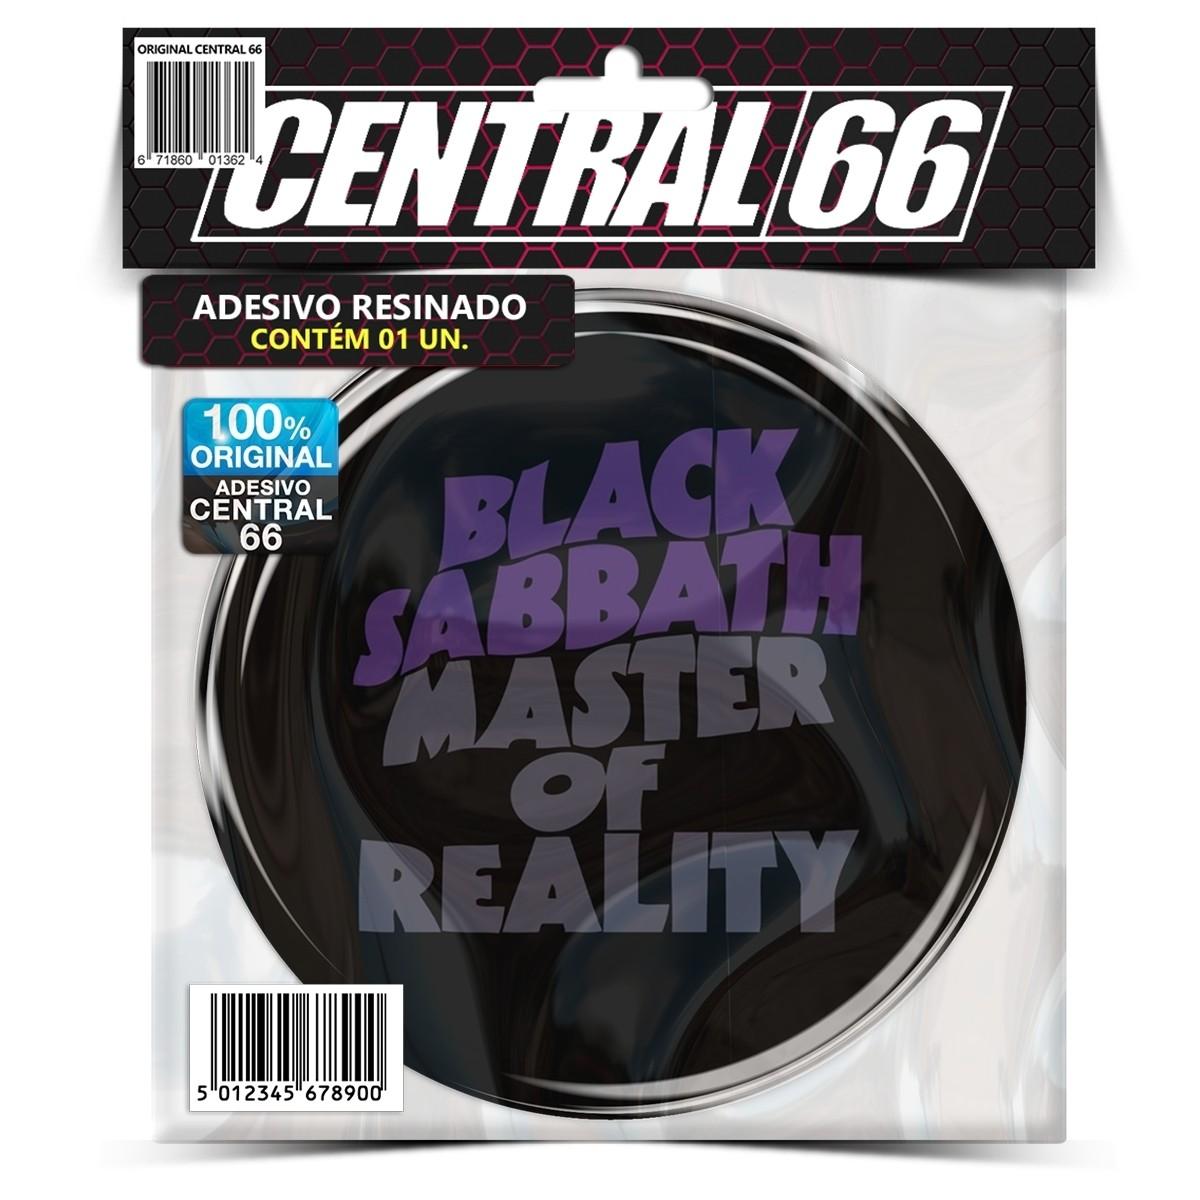 Adesivo Redondo Black Sabbath Master of Reallity – Central 66